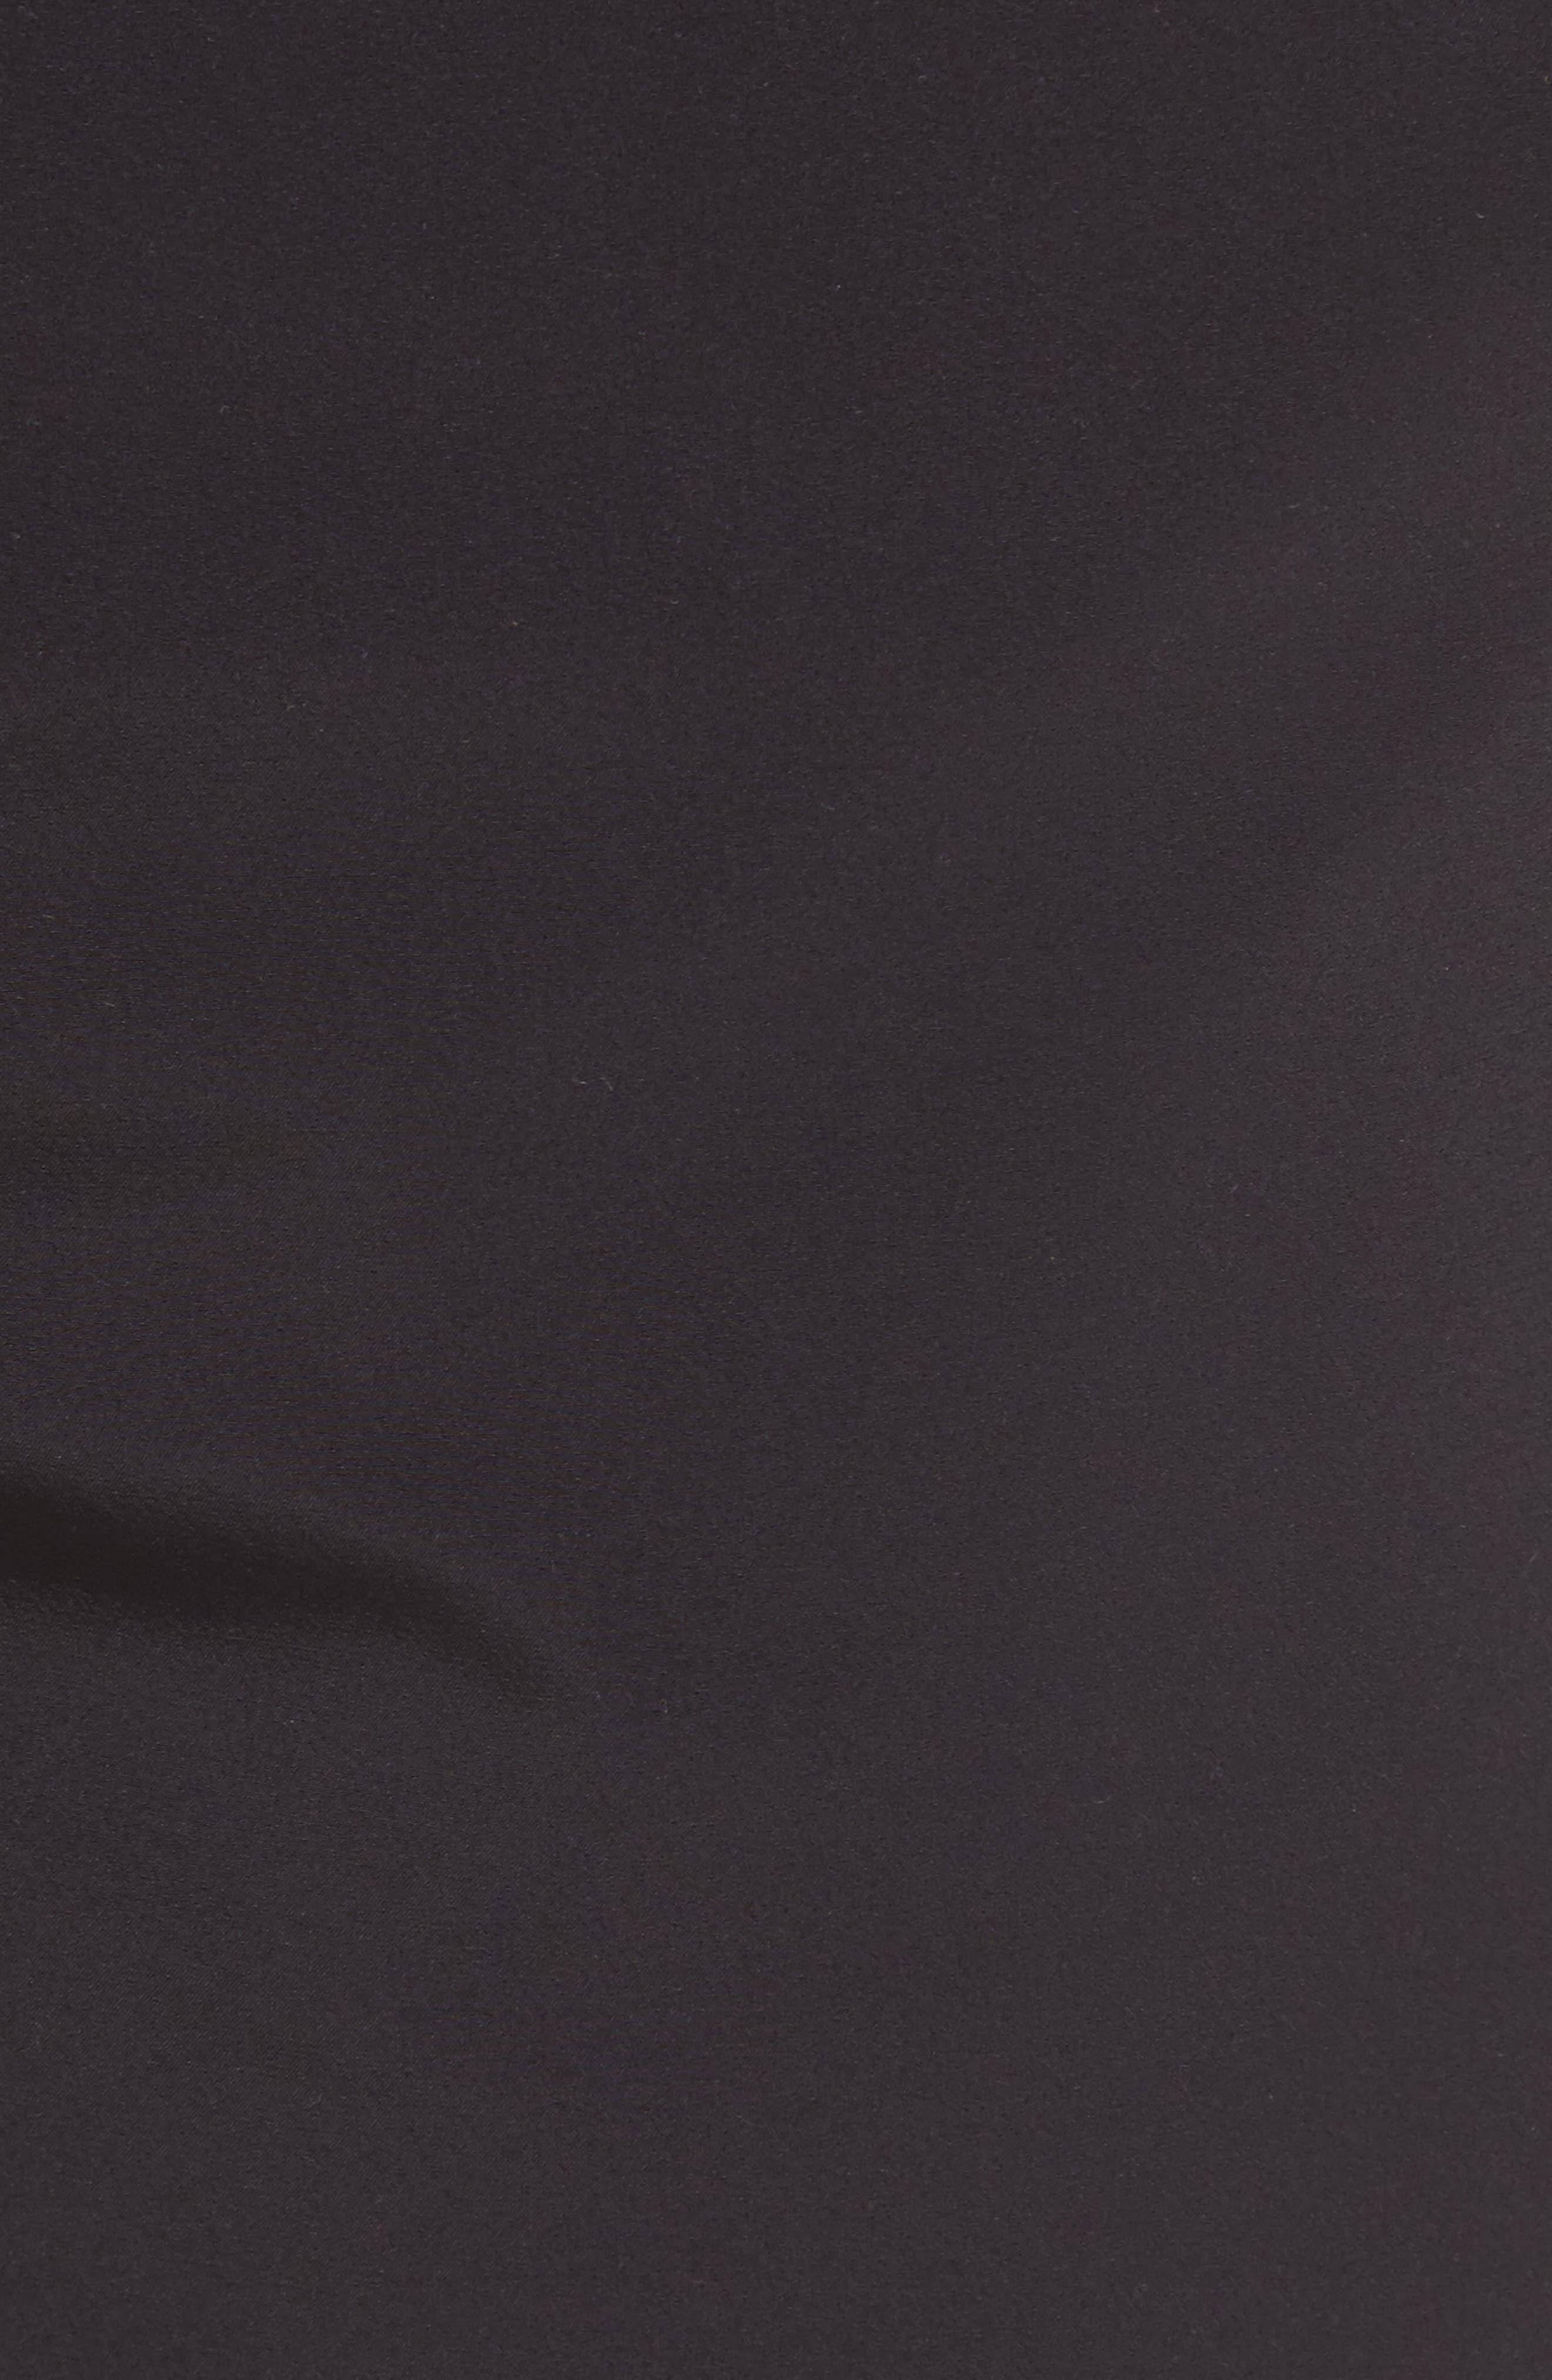 Oslo Sport Shorts,                             Alternate thumbnail 5, color,                             Black